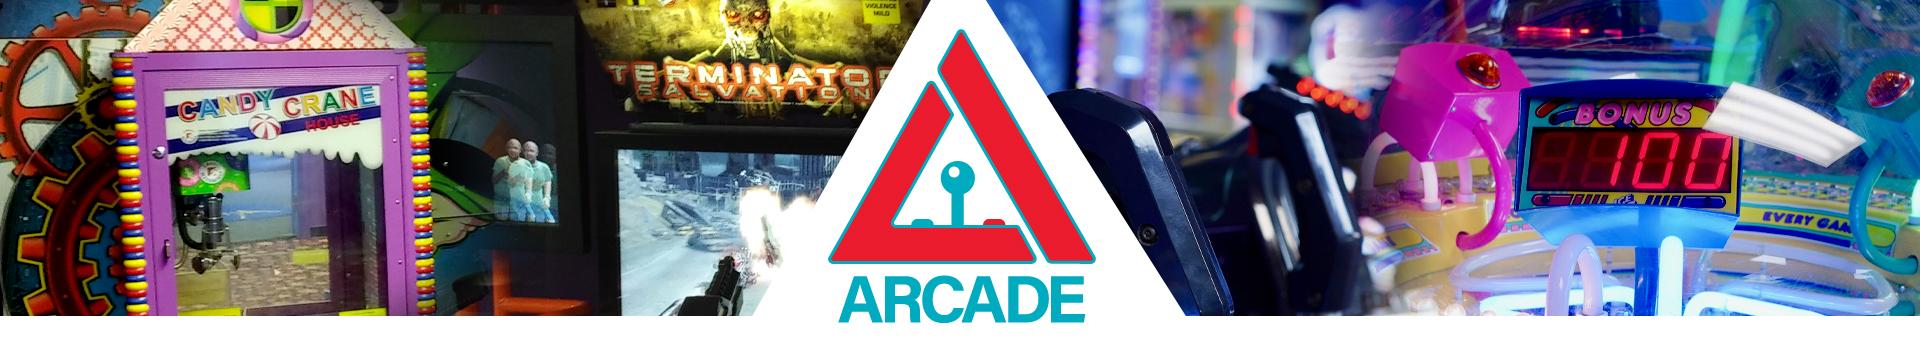 activekidz arcade